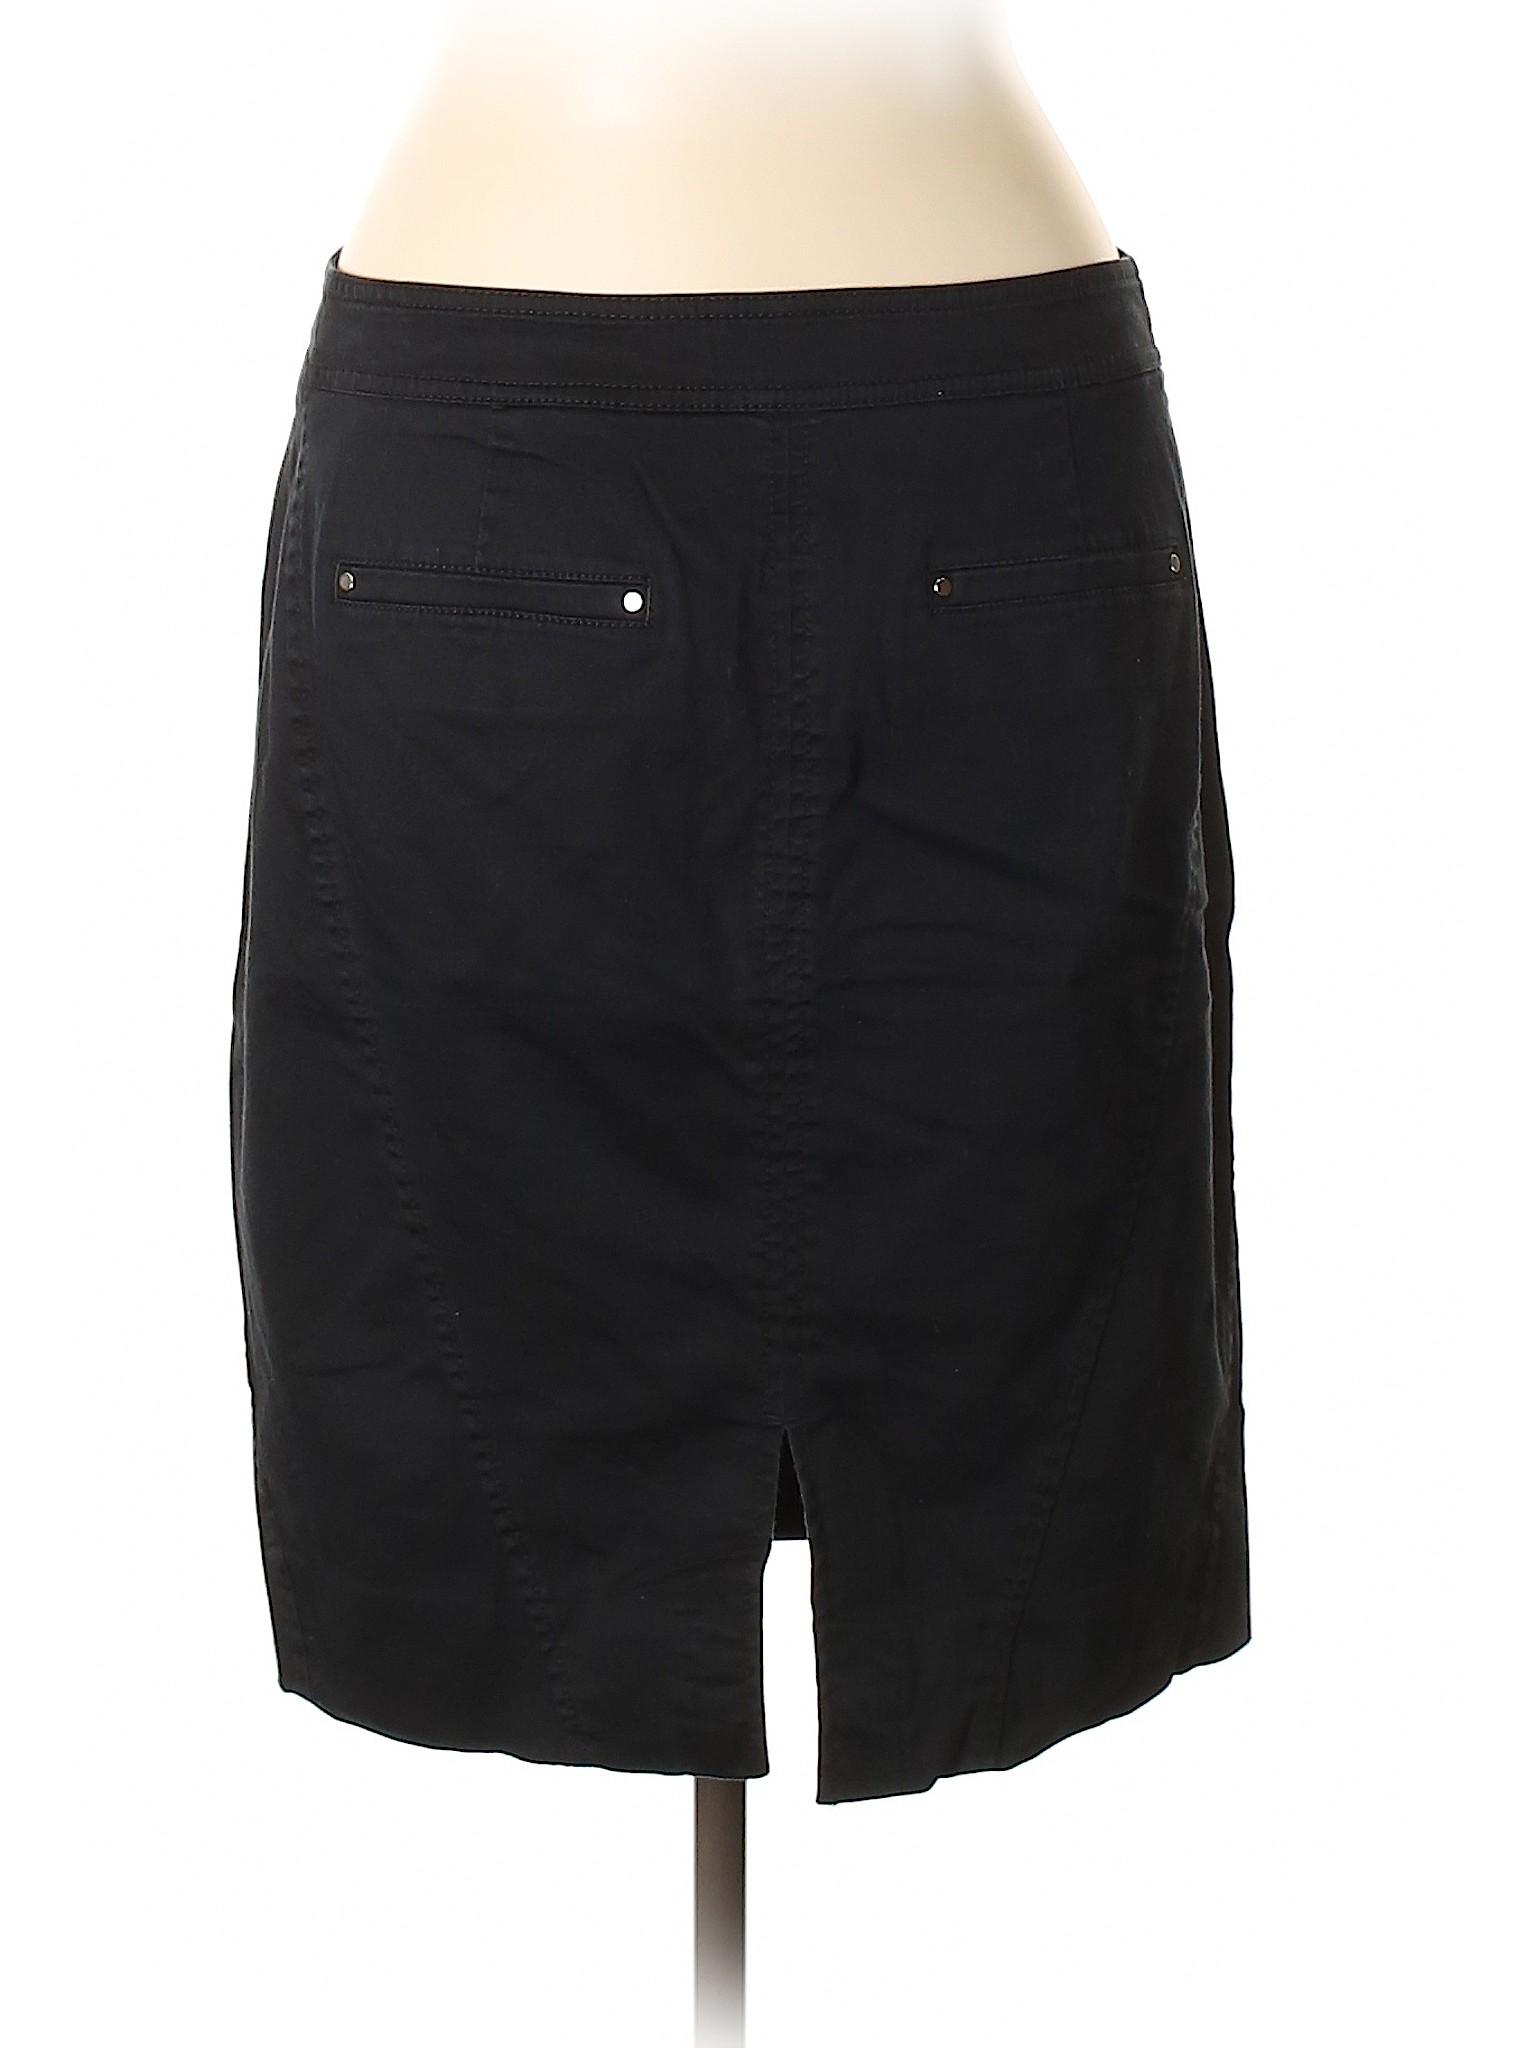 Skirt Boutique Skirt Boutique Boutique Casual Casual Casual Skirt 8w4OZqZn